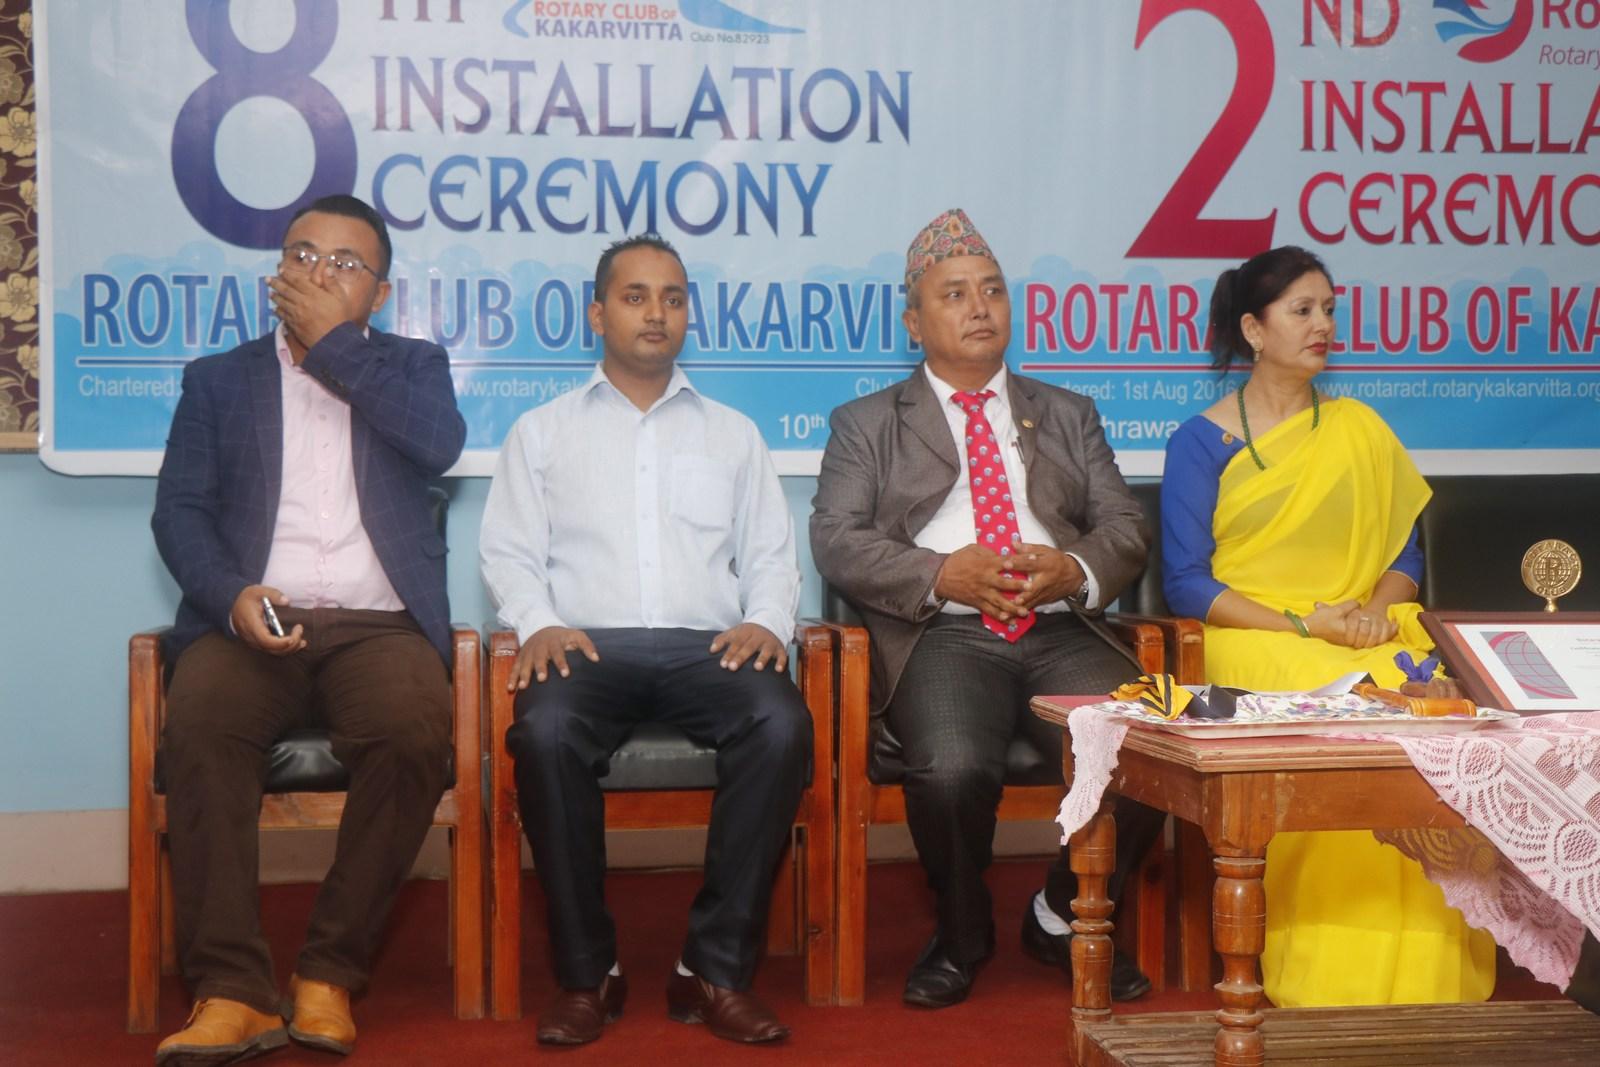 8th-Installation-Ceremony-Rotary-Club-of-Kakarvitta-3